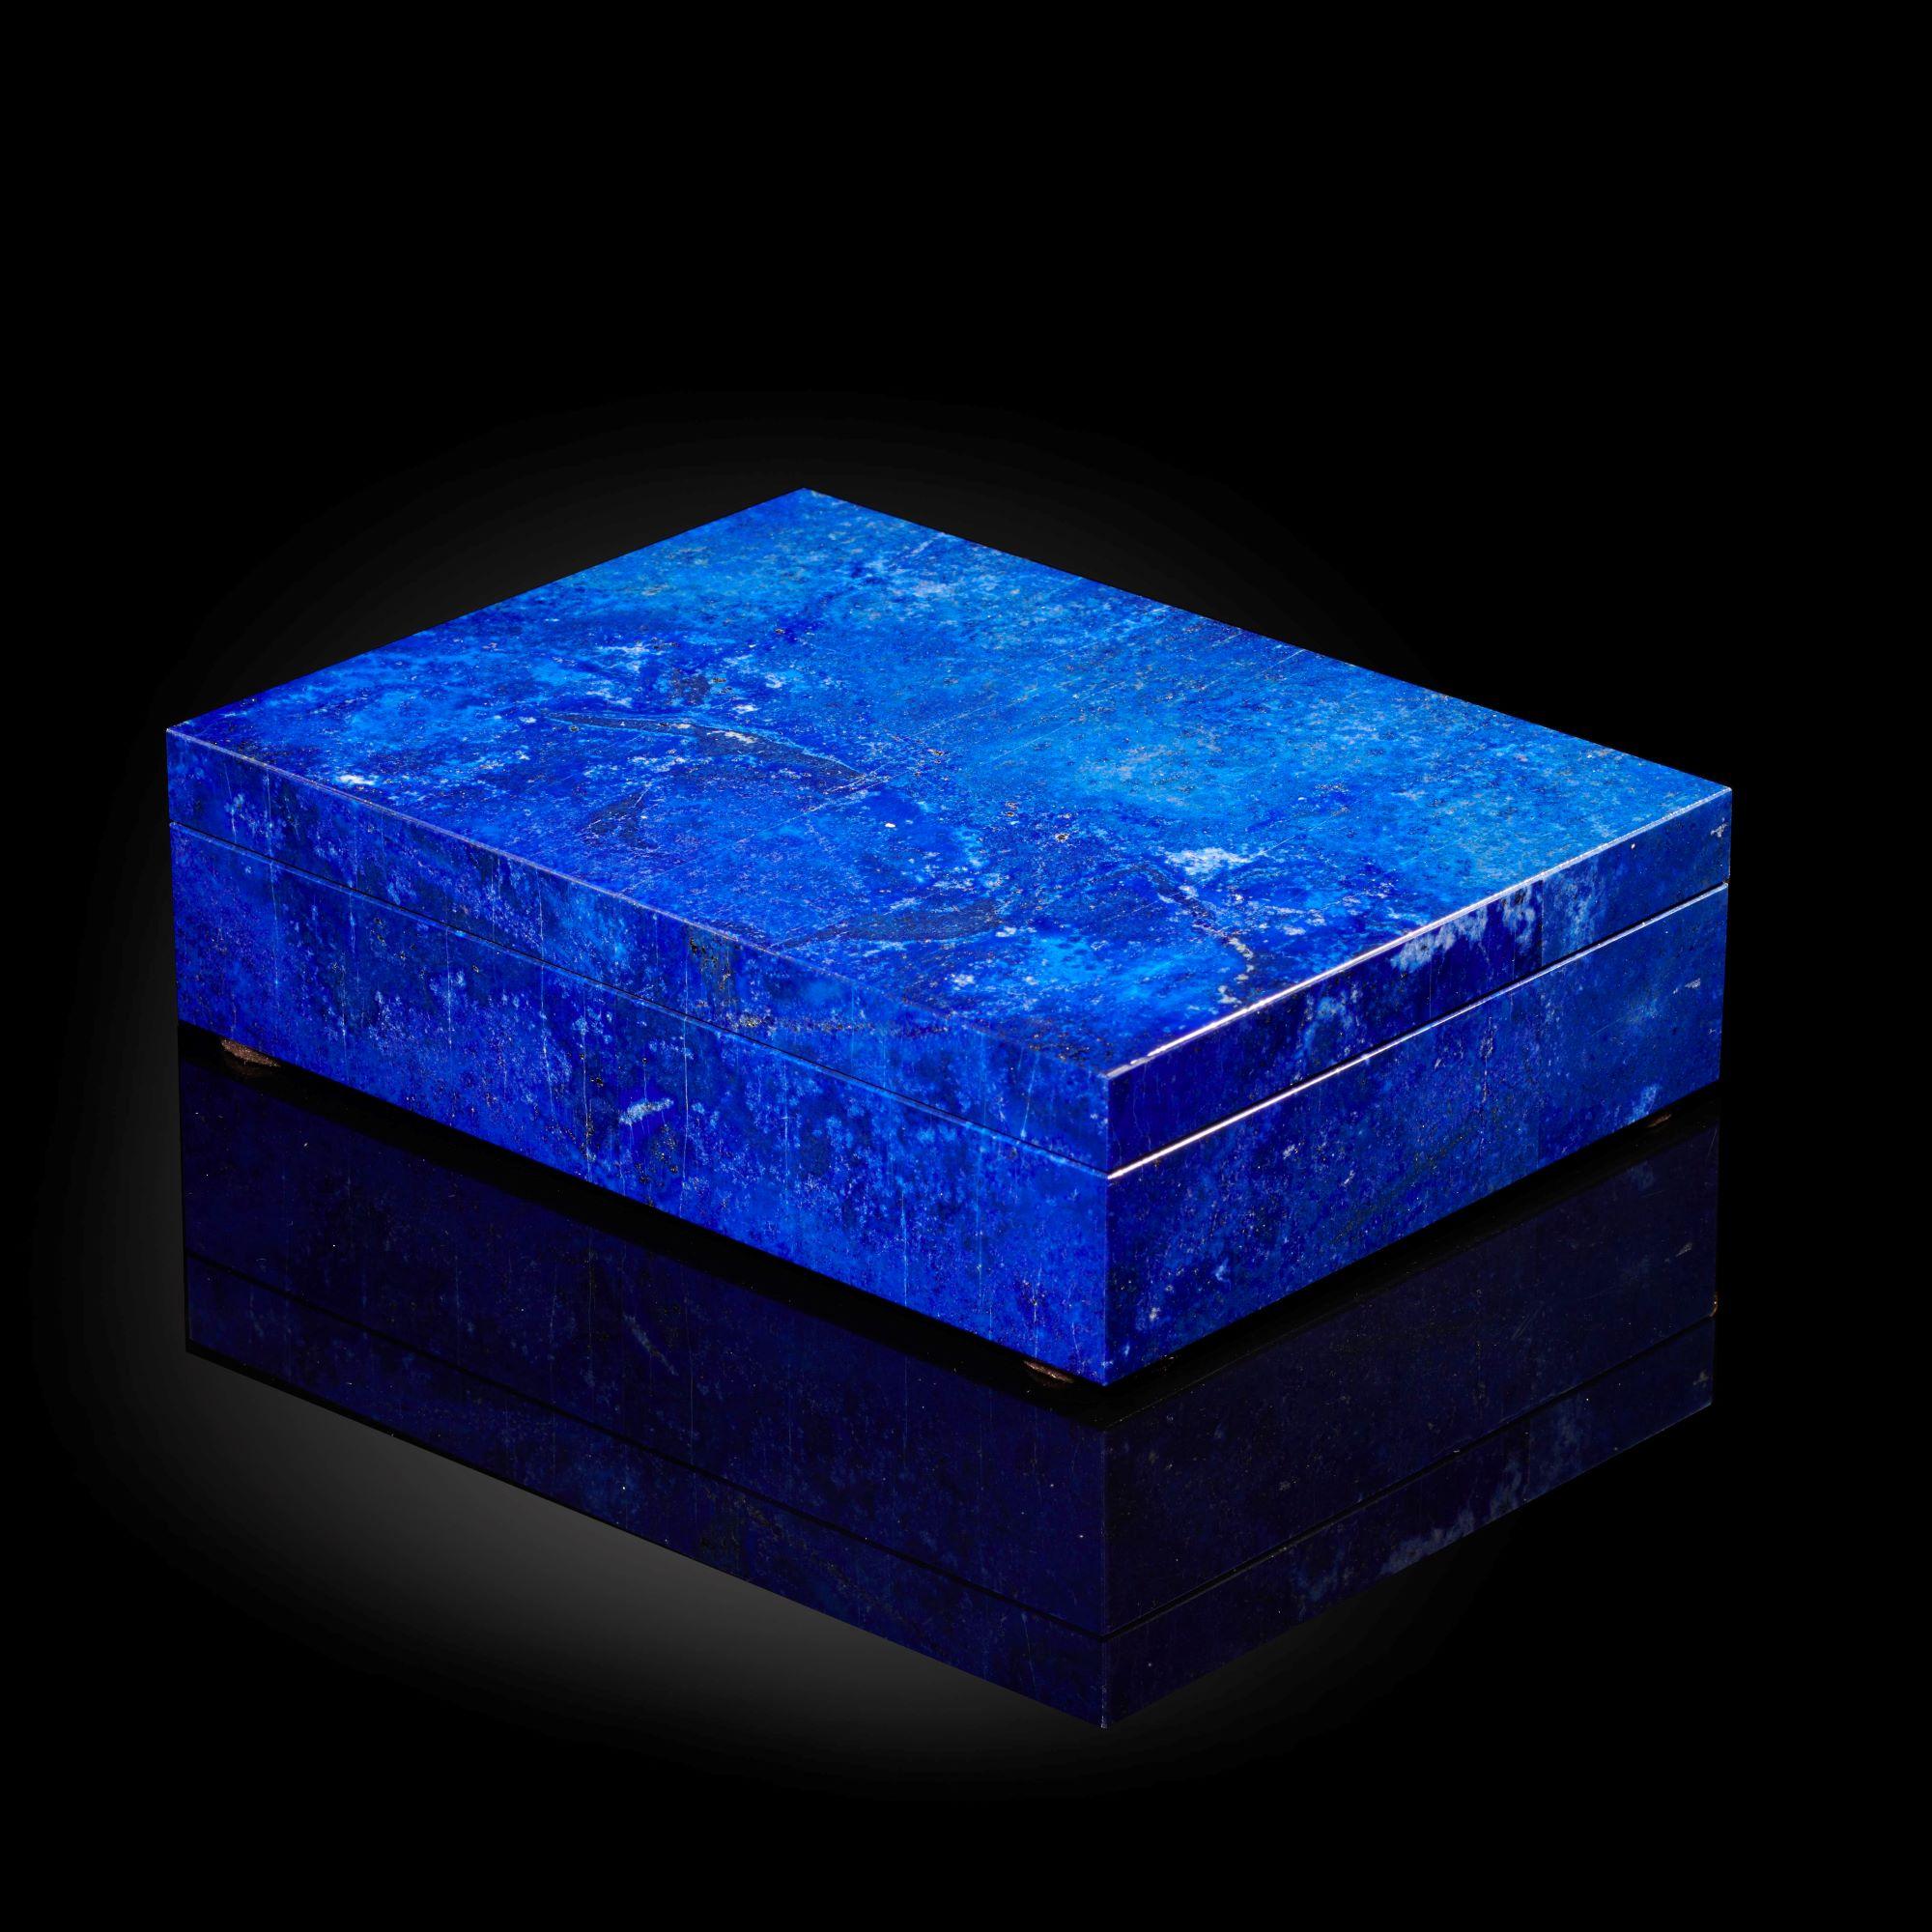 Lot 10 - Interior Design/Minerals: A lapis lazuli veneered box, 4cm high by 15cm wide by 11cm deep